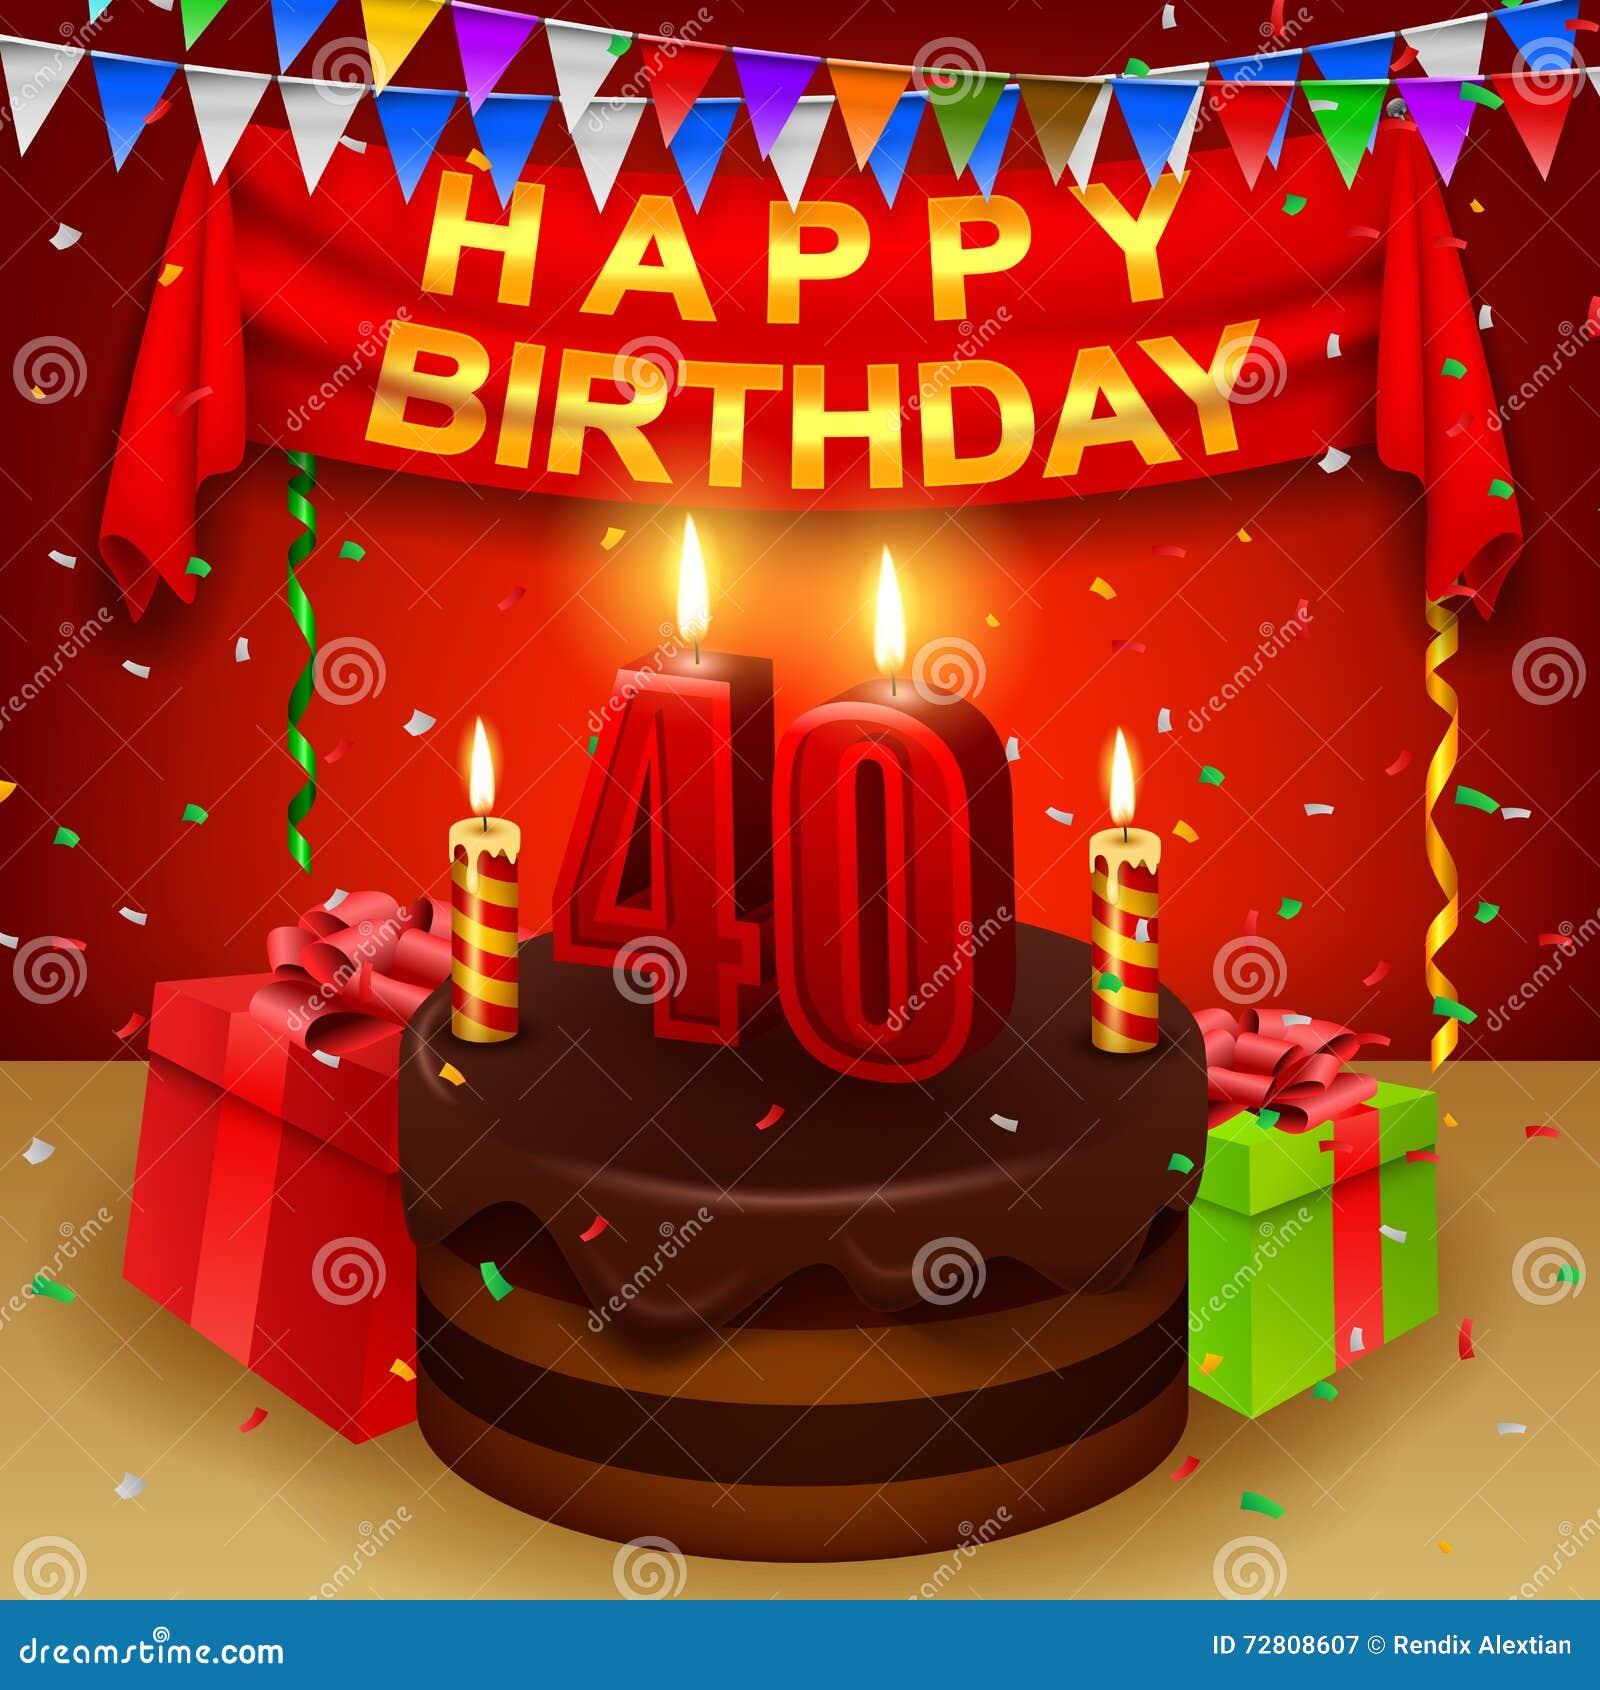 Happy 40th Birthday With Chocolate Cream Cake And Triangular Flag